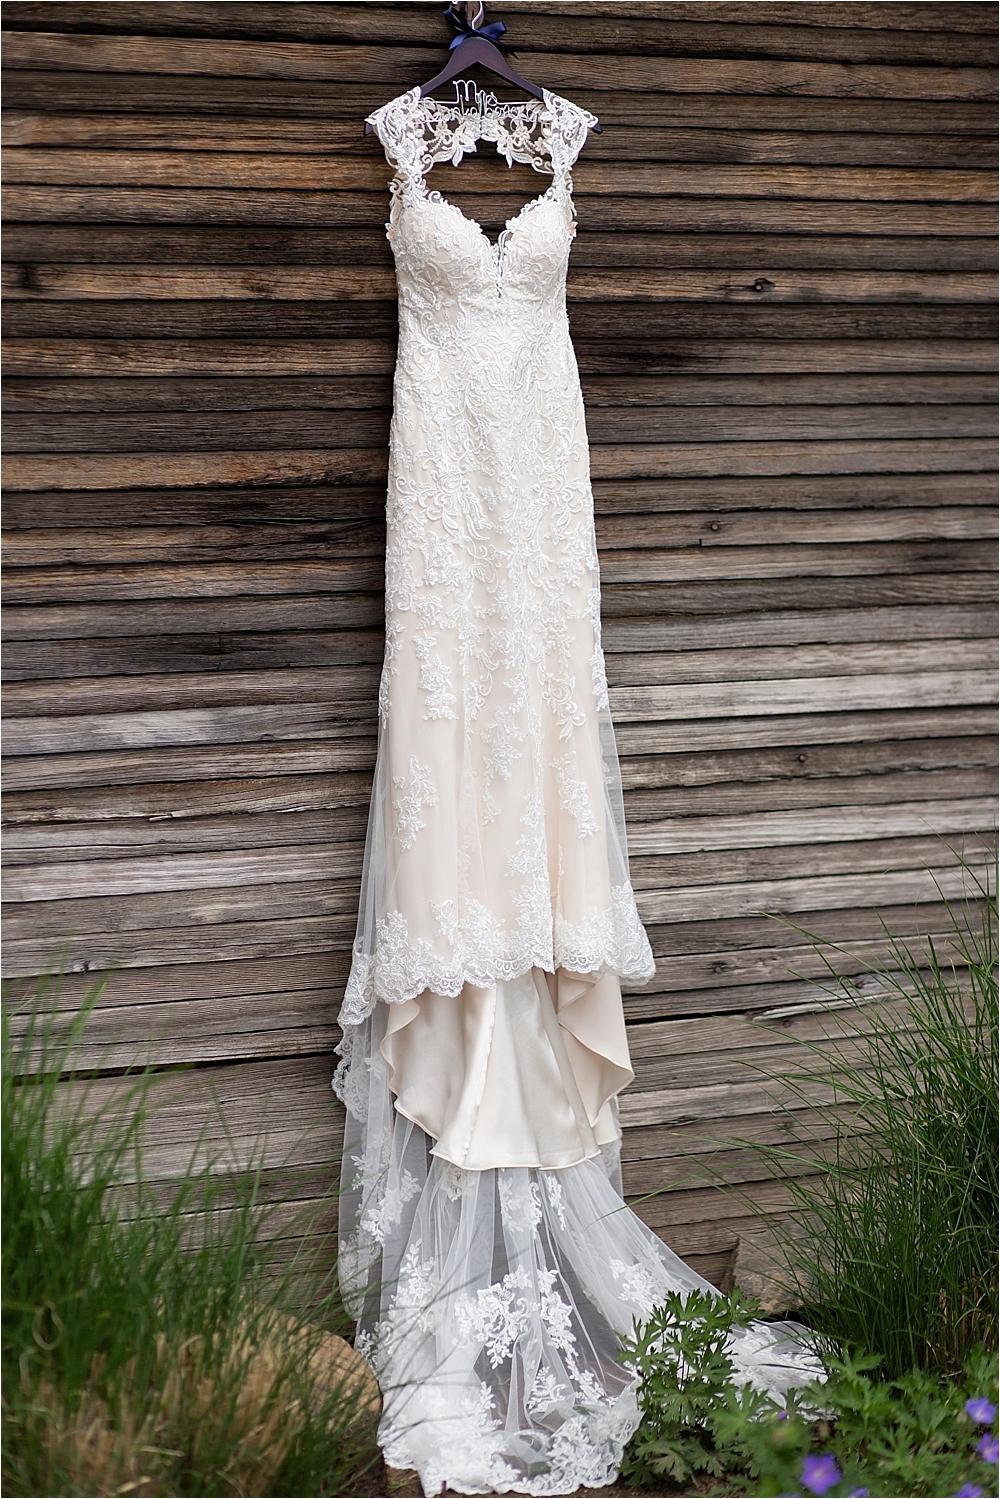 Tessi + Bryce's Raccoon Creek Wedding_0002.jpg